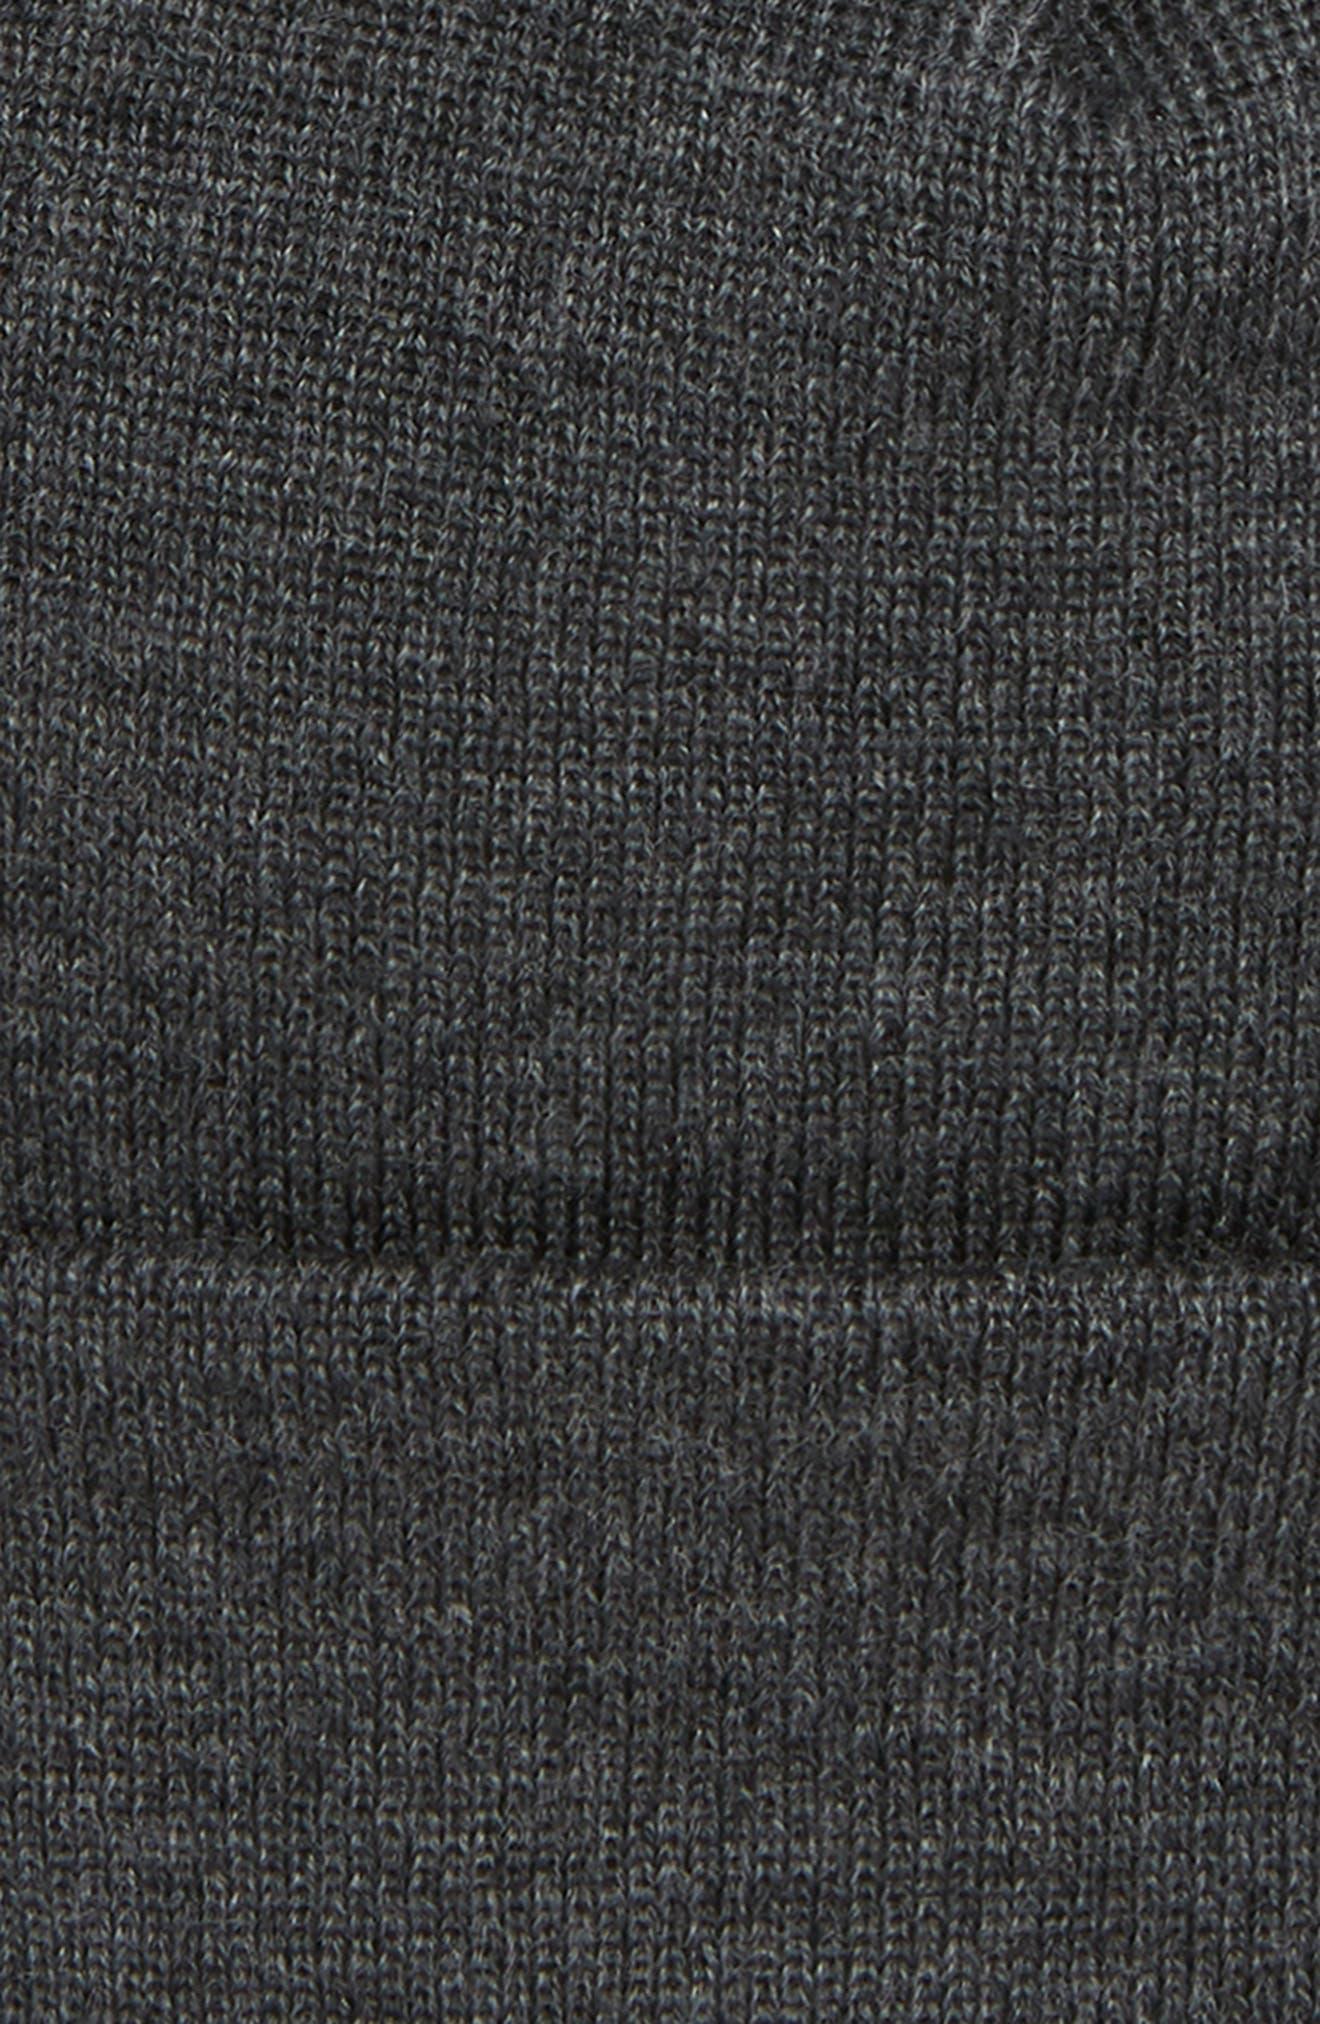 Merino Wool Beanie,                             Alternate thumbnail 2, color,                             010